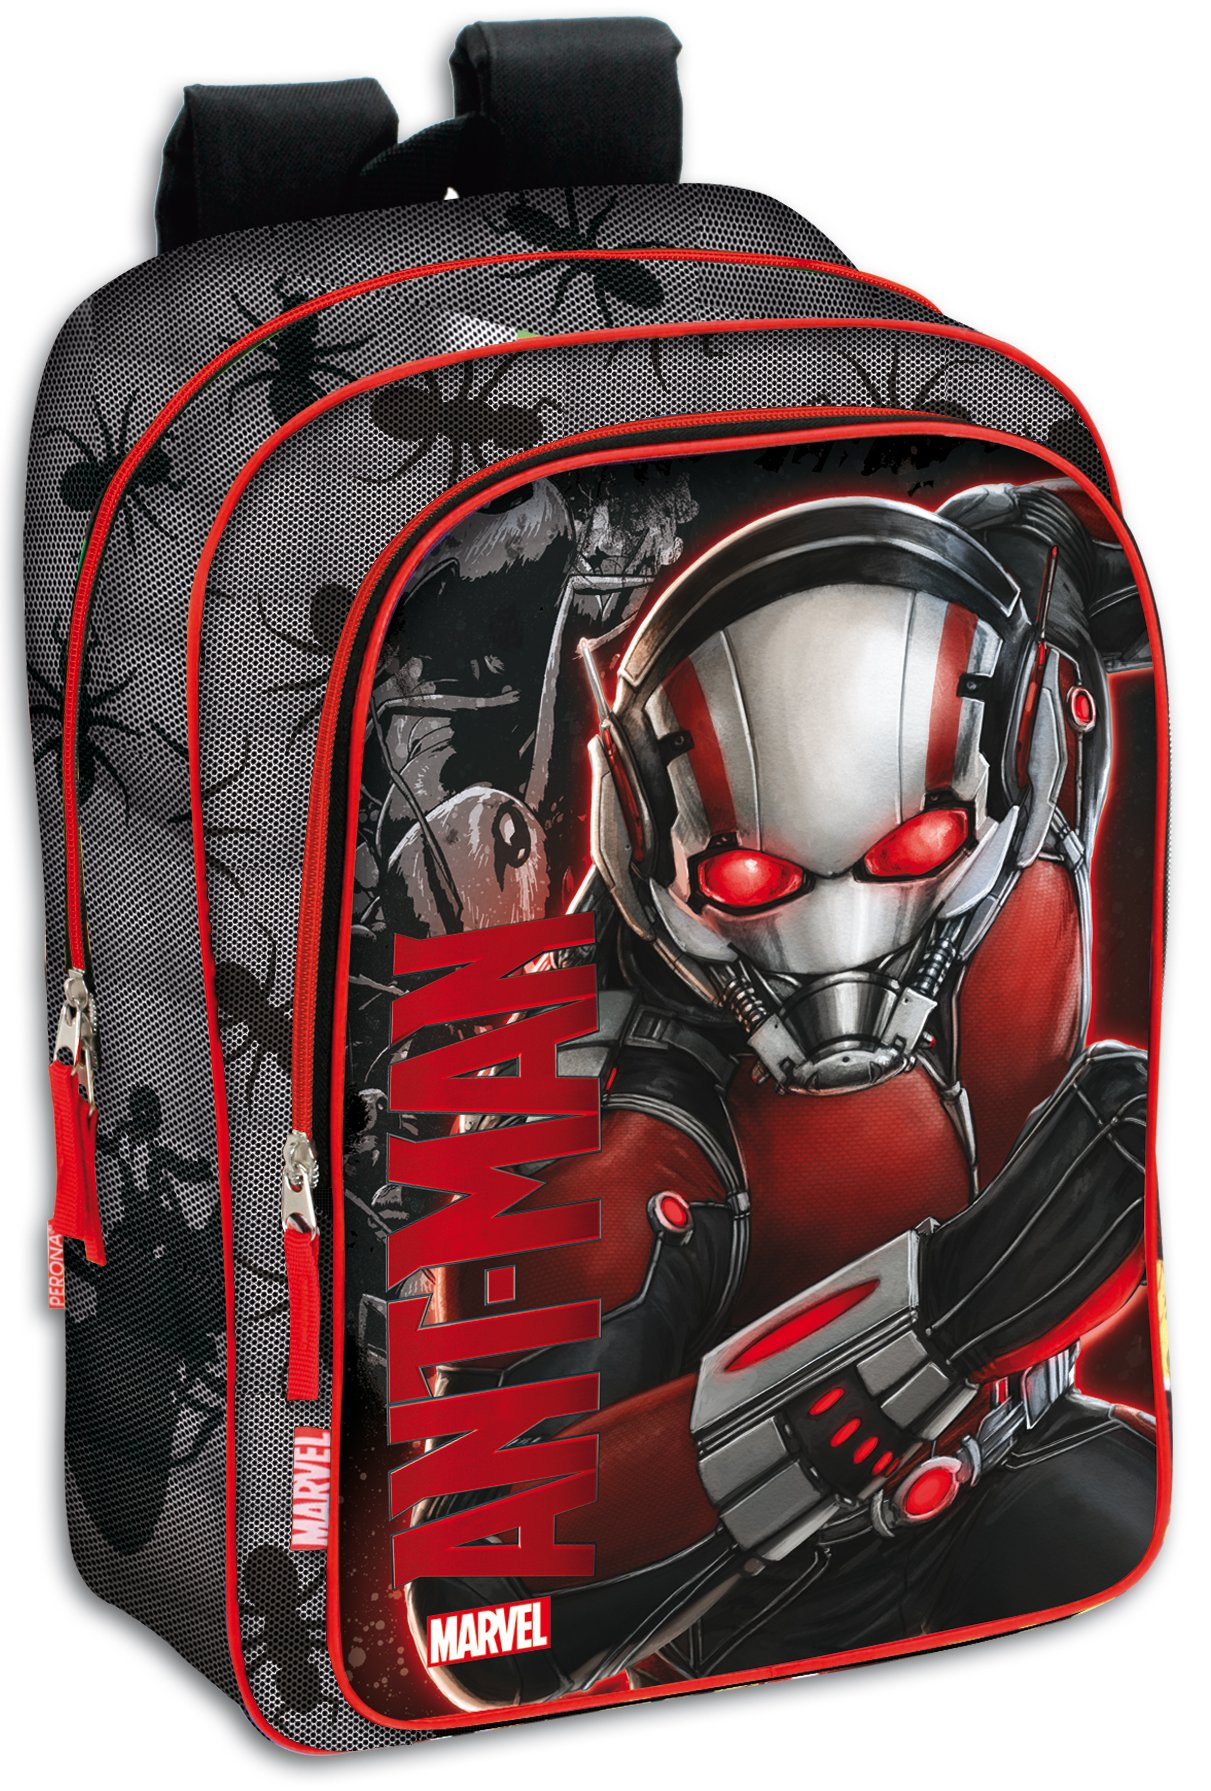 e7da062183f Τσάντα με μπροστινή θήκη Αnt-Man Avengers μεγάλη | ToysForKids e-shop